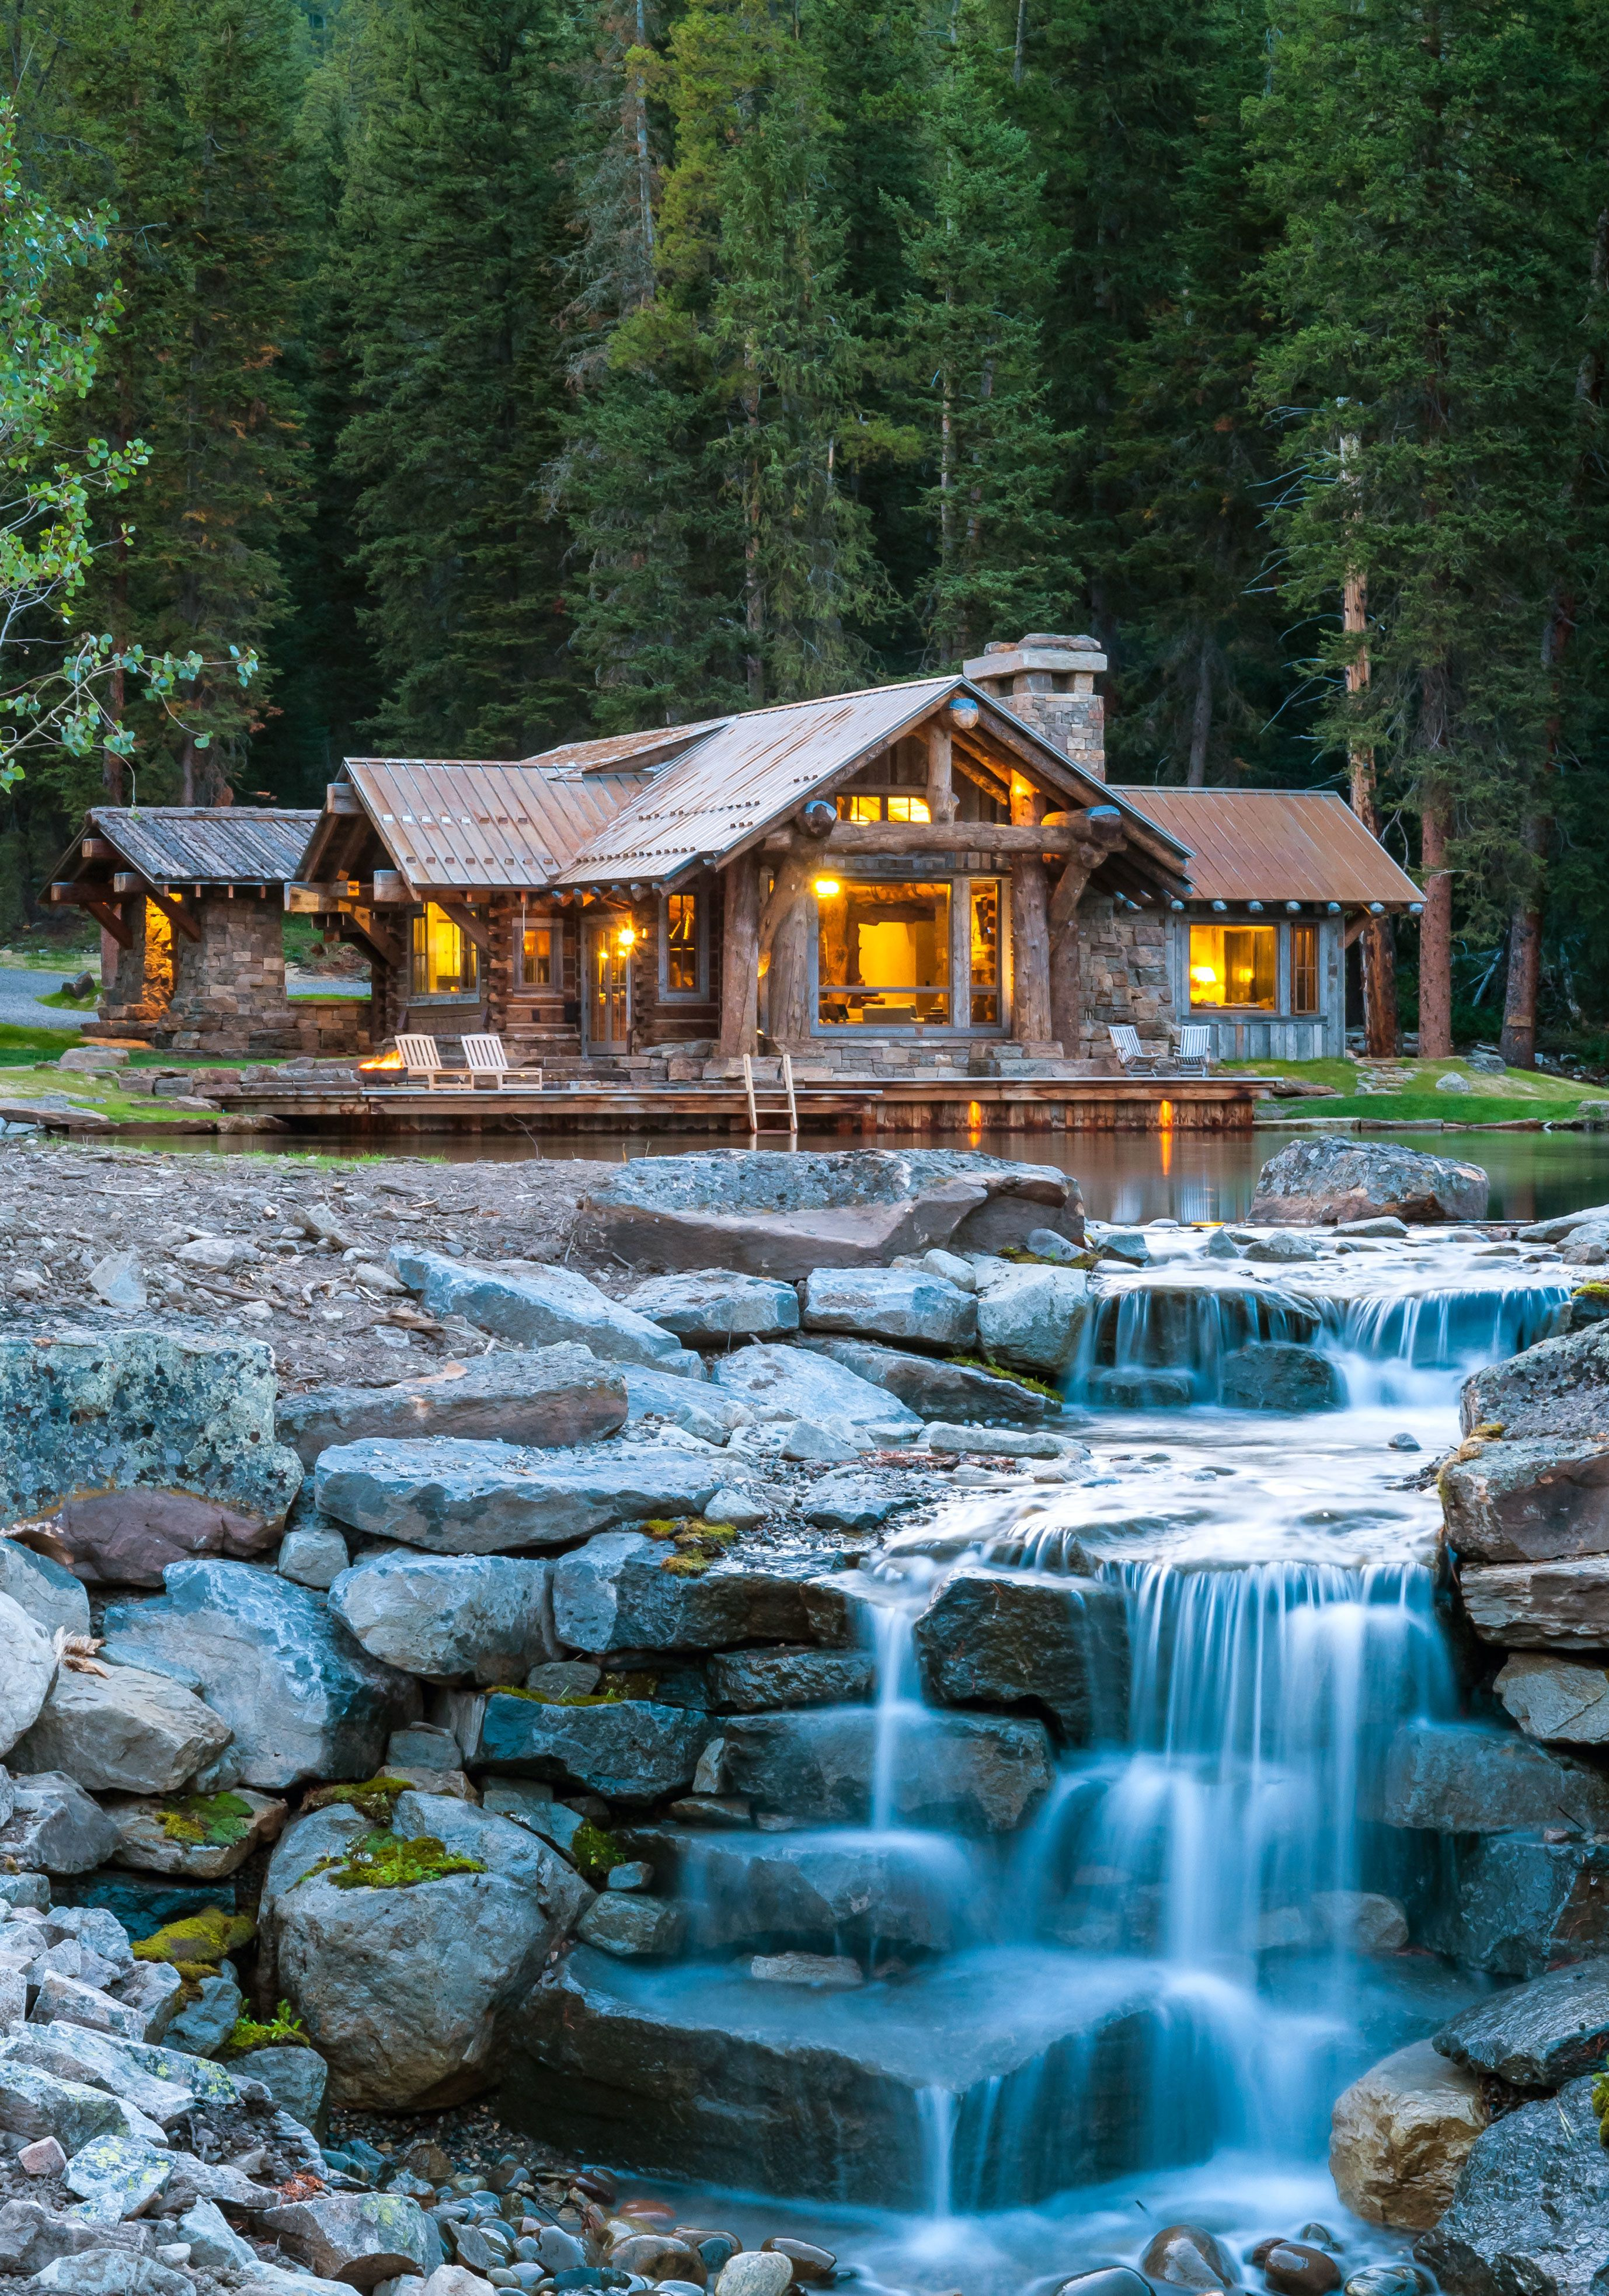 babb ranch sale cabin acreage for montana cabins farm